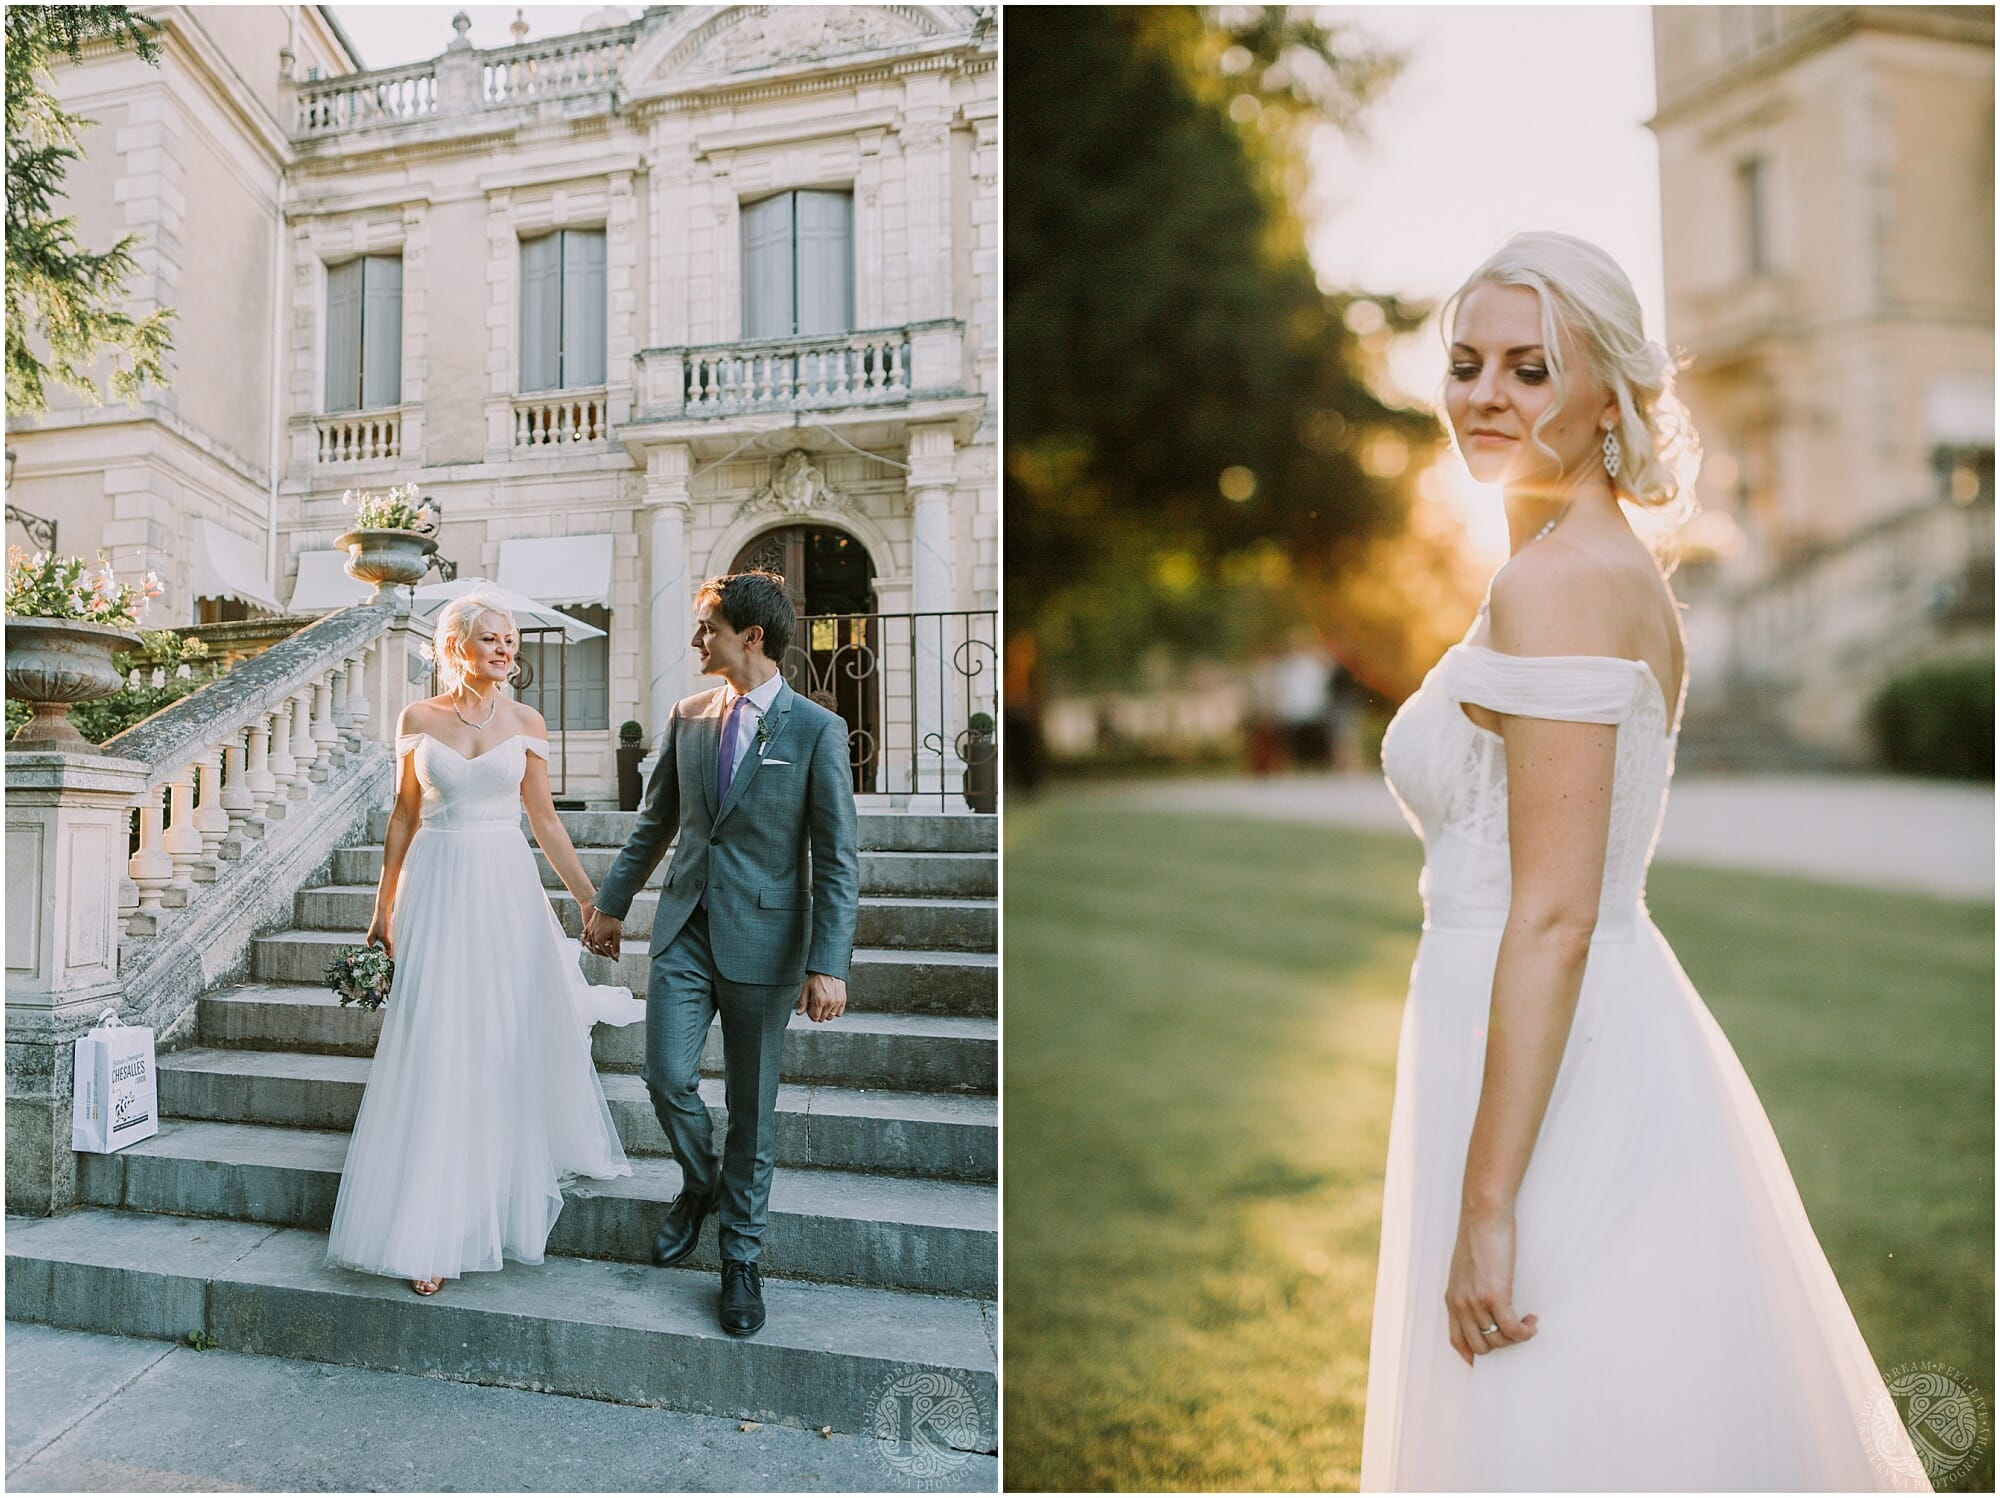 Kateryna-photos-photographe-mariage-chateau-des-3-fontaines-provence-avignon-vaucluse-sud_0107.jpg